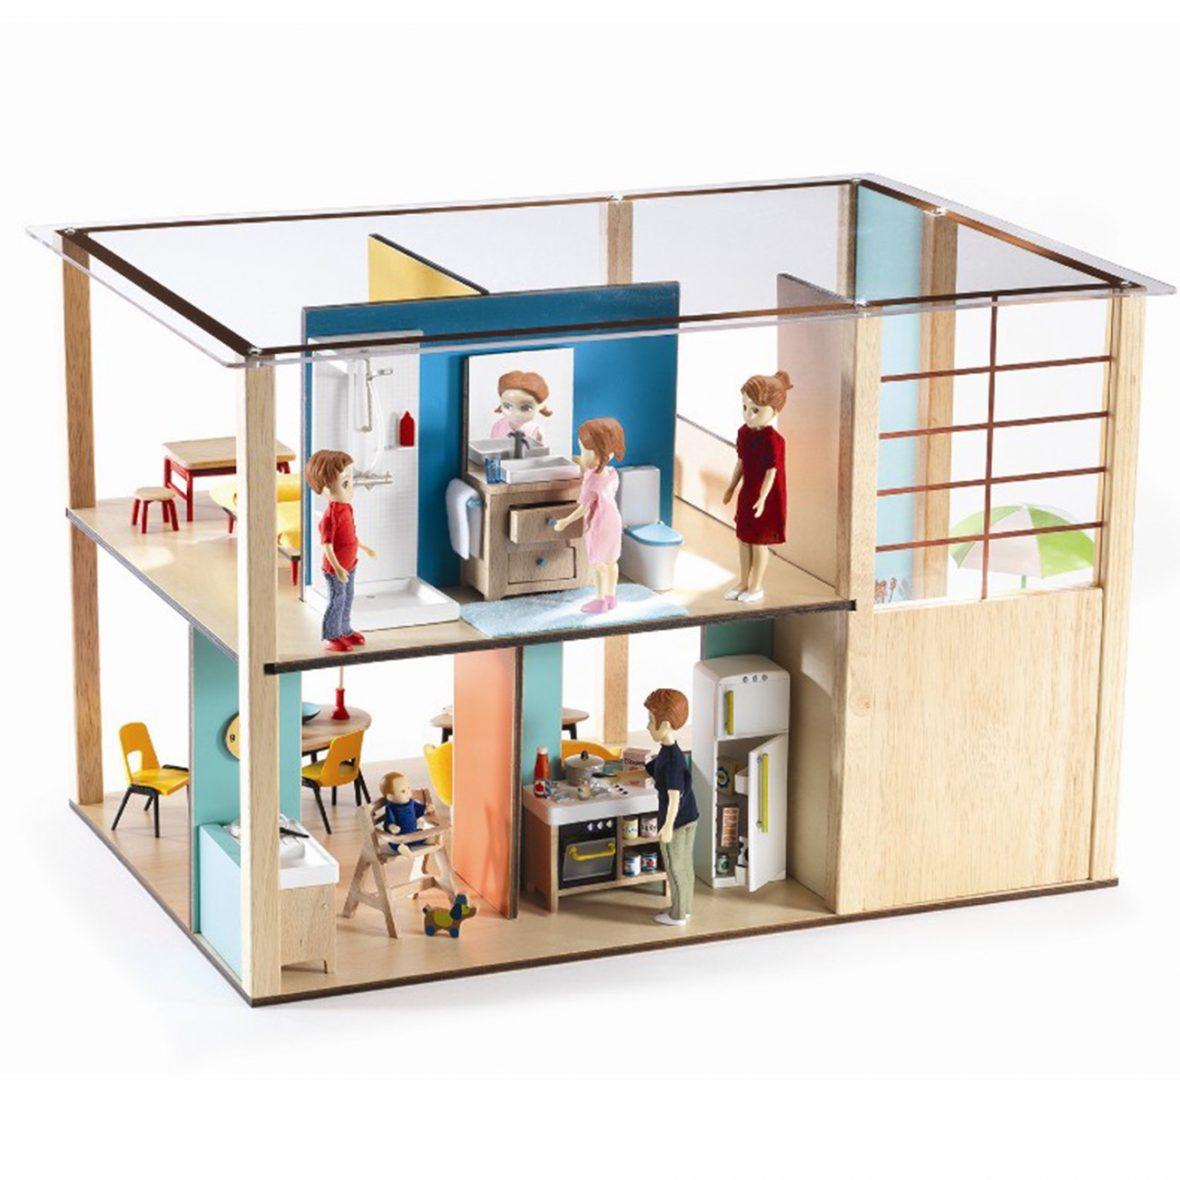 Cubic Dolls House